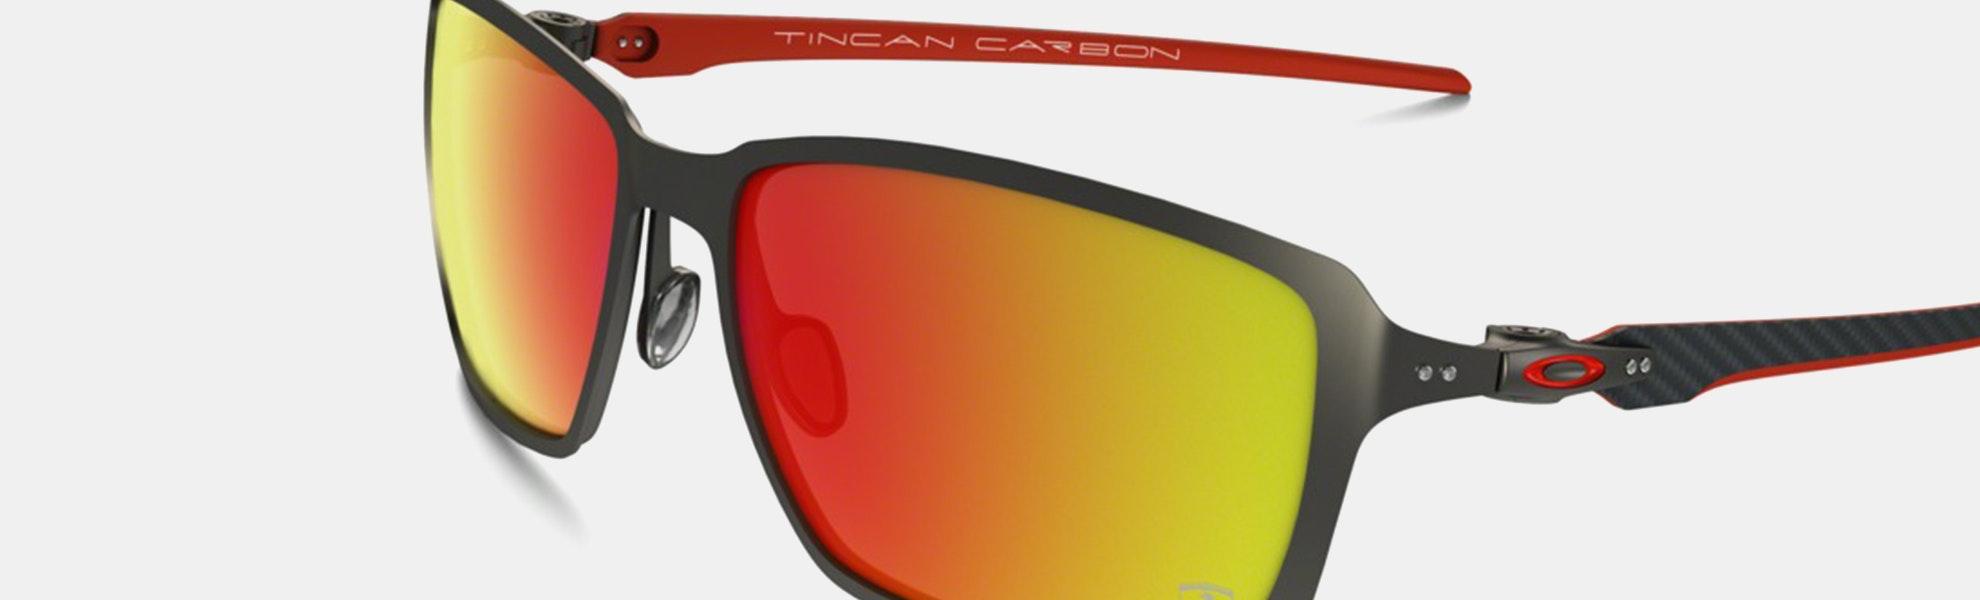 Oakley Ferrari Carbon Iridium Sunglasses